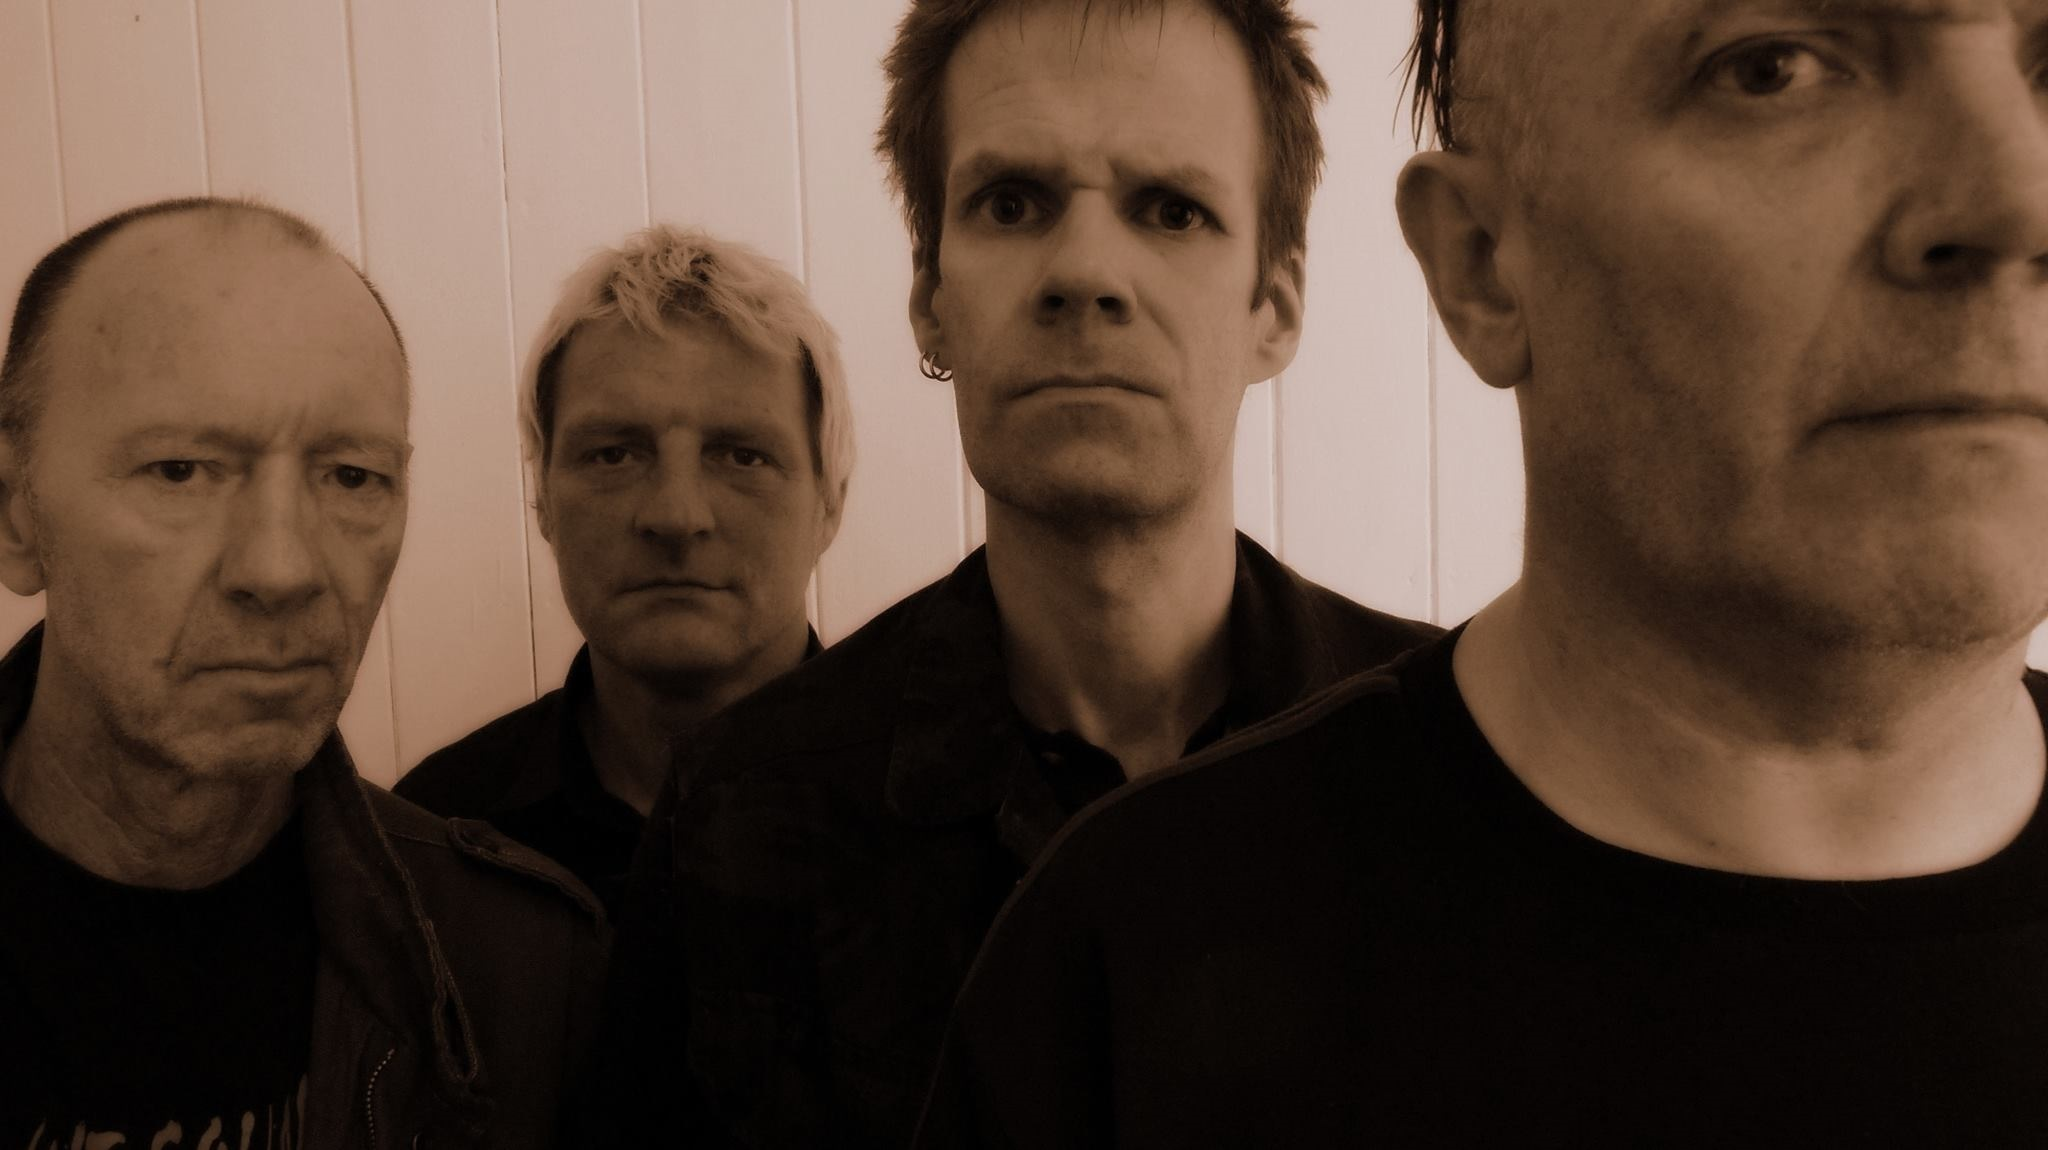 Original punk legends Sham 69 to play the Alma in Bolton - The Bolton News